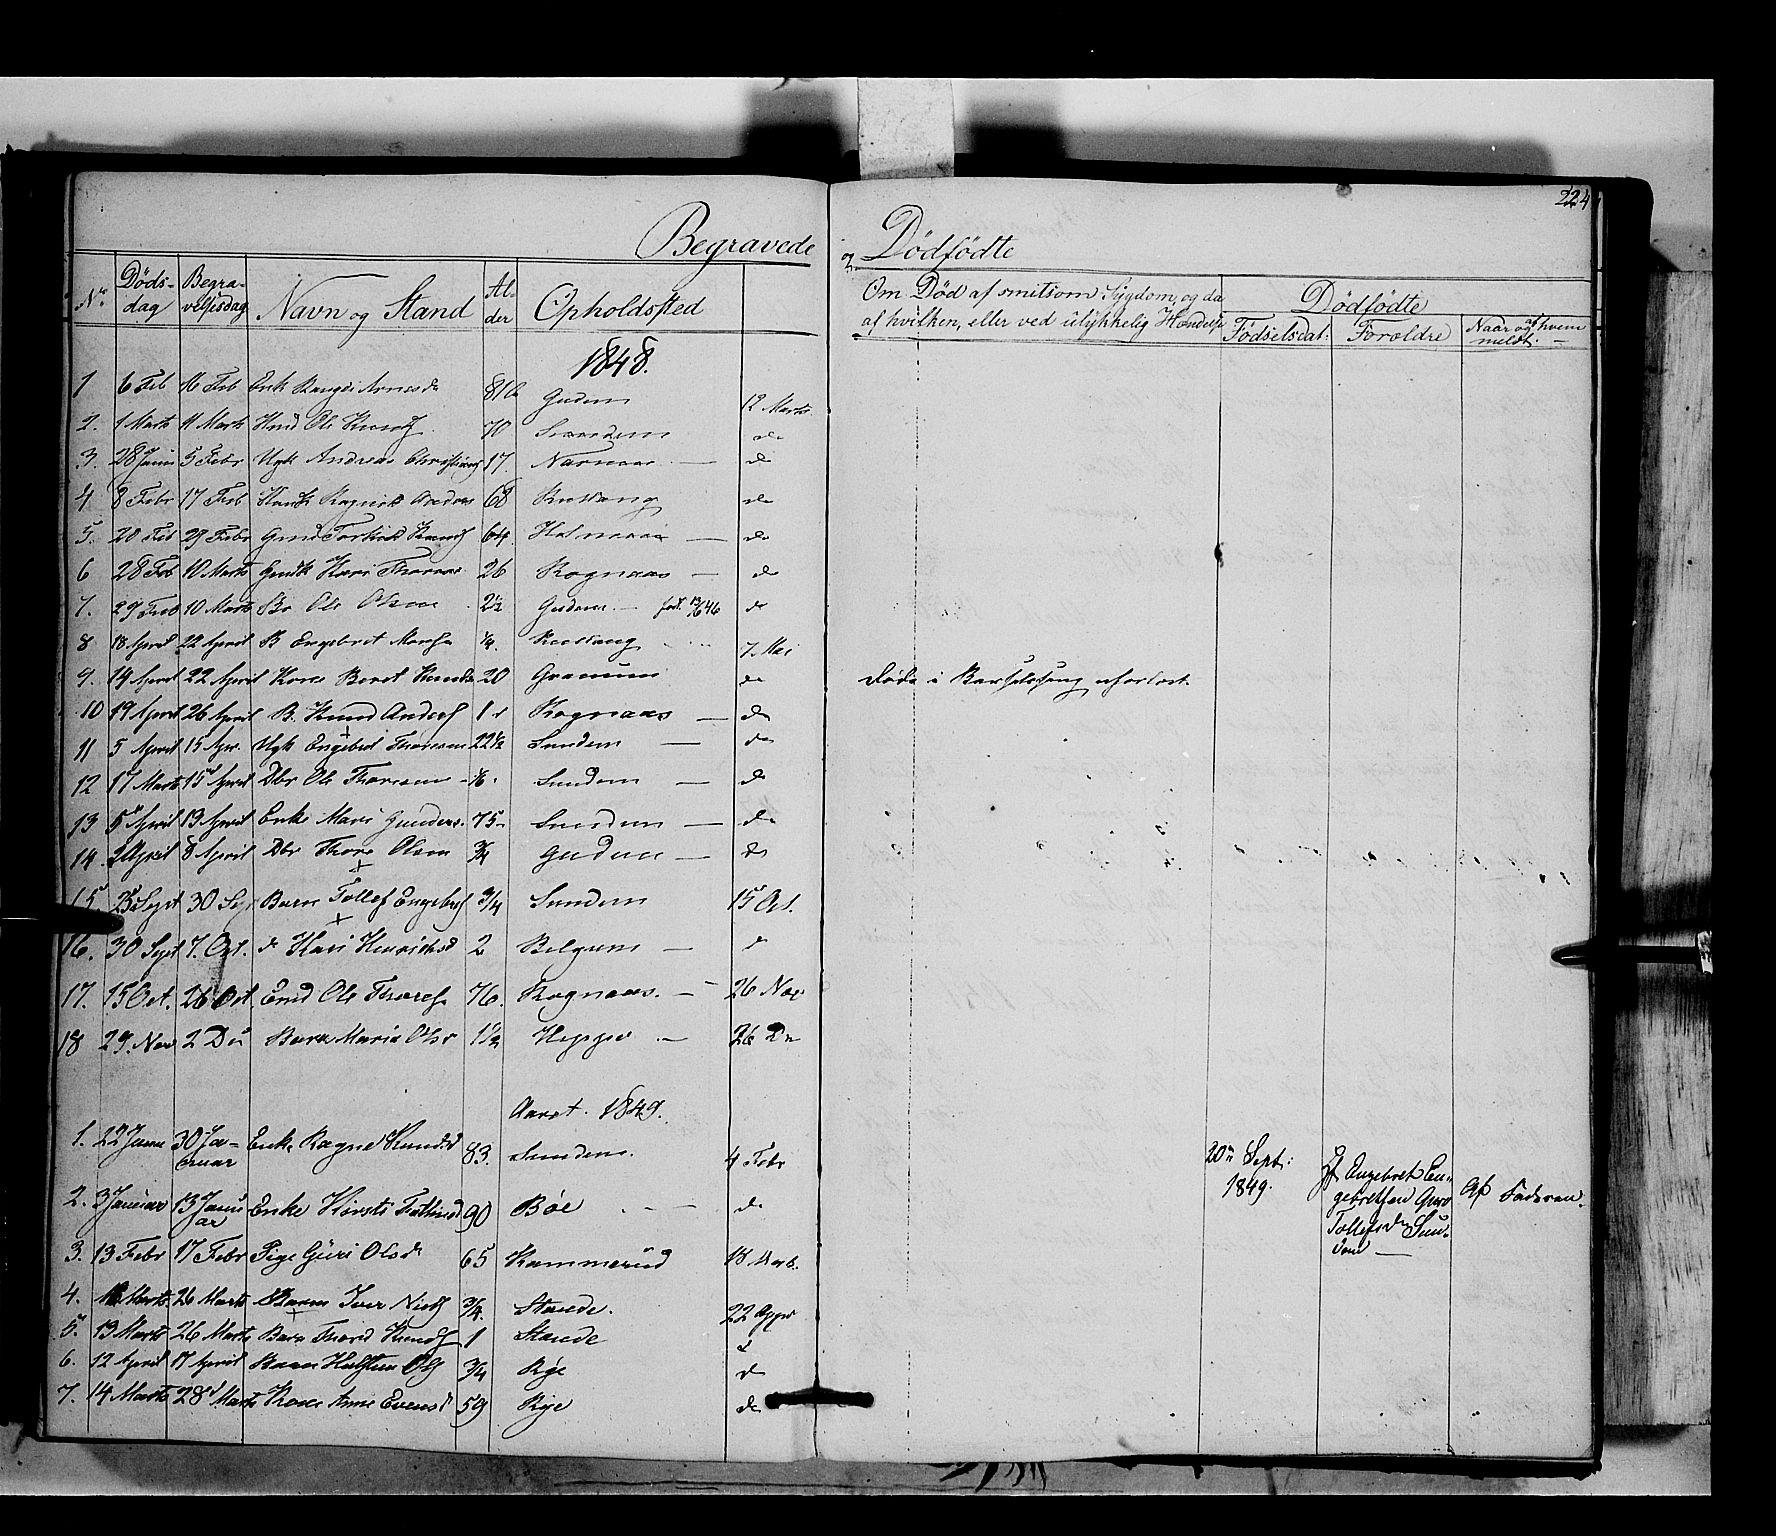 SAH, Nord-Aurdal prestekontor, Ministerialbok nr. 6, 1842-1863, s. 224